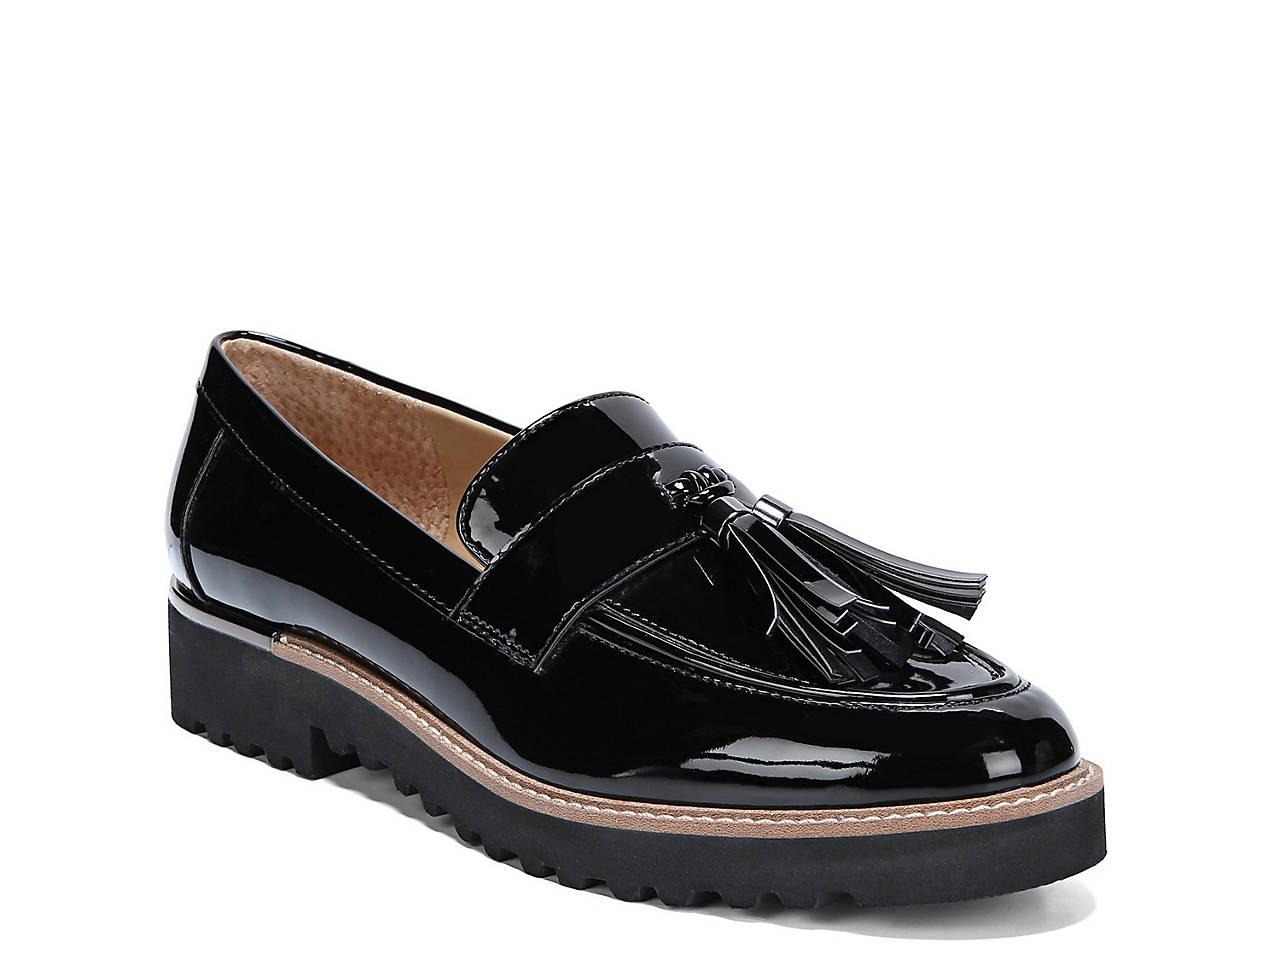 e3d594364bb061 Franco Sarto Carney Loafer Women s Shoes